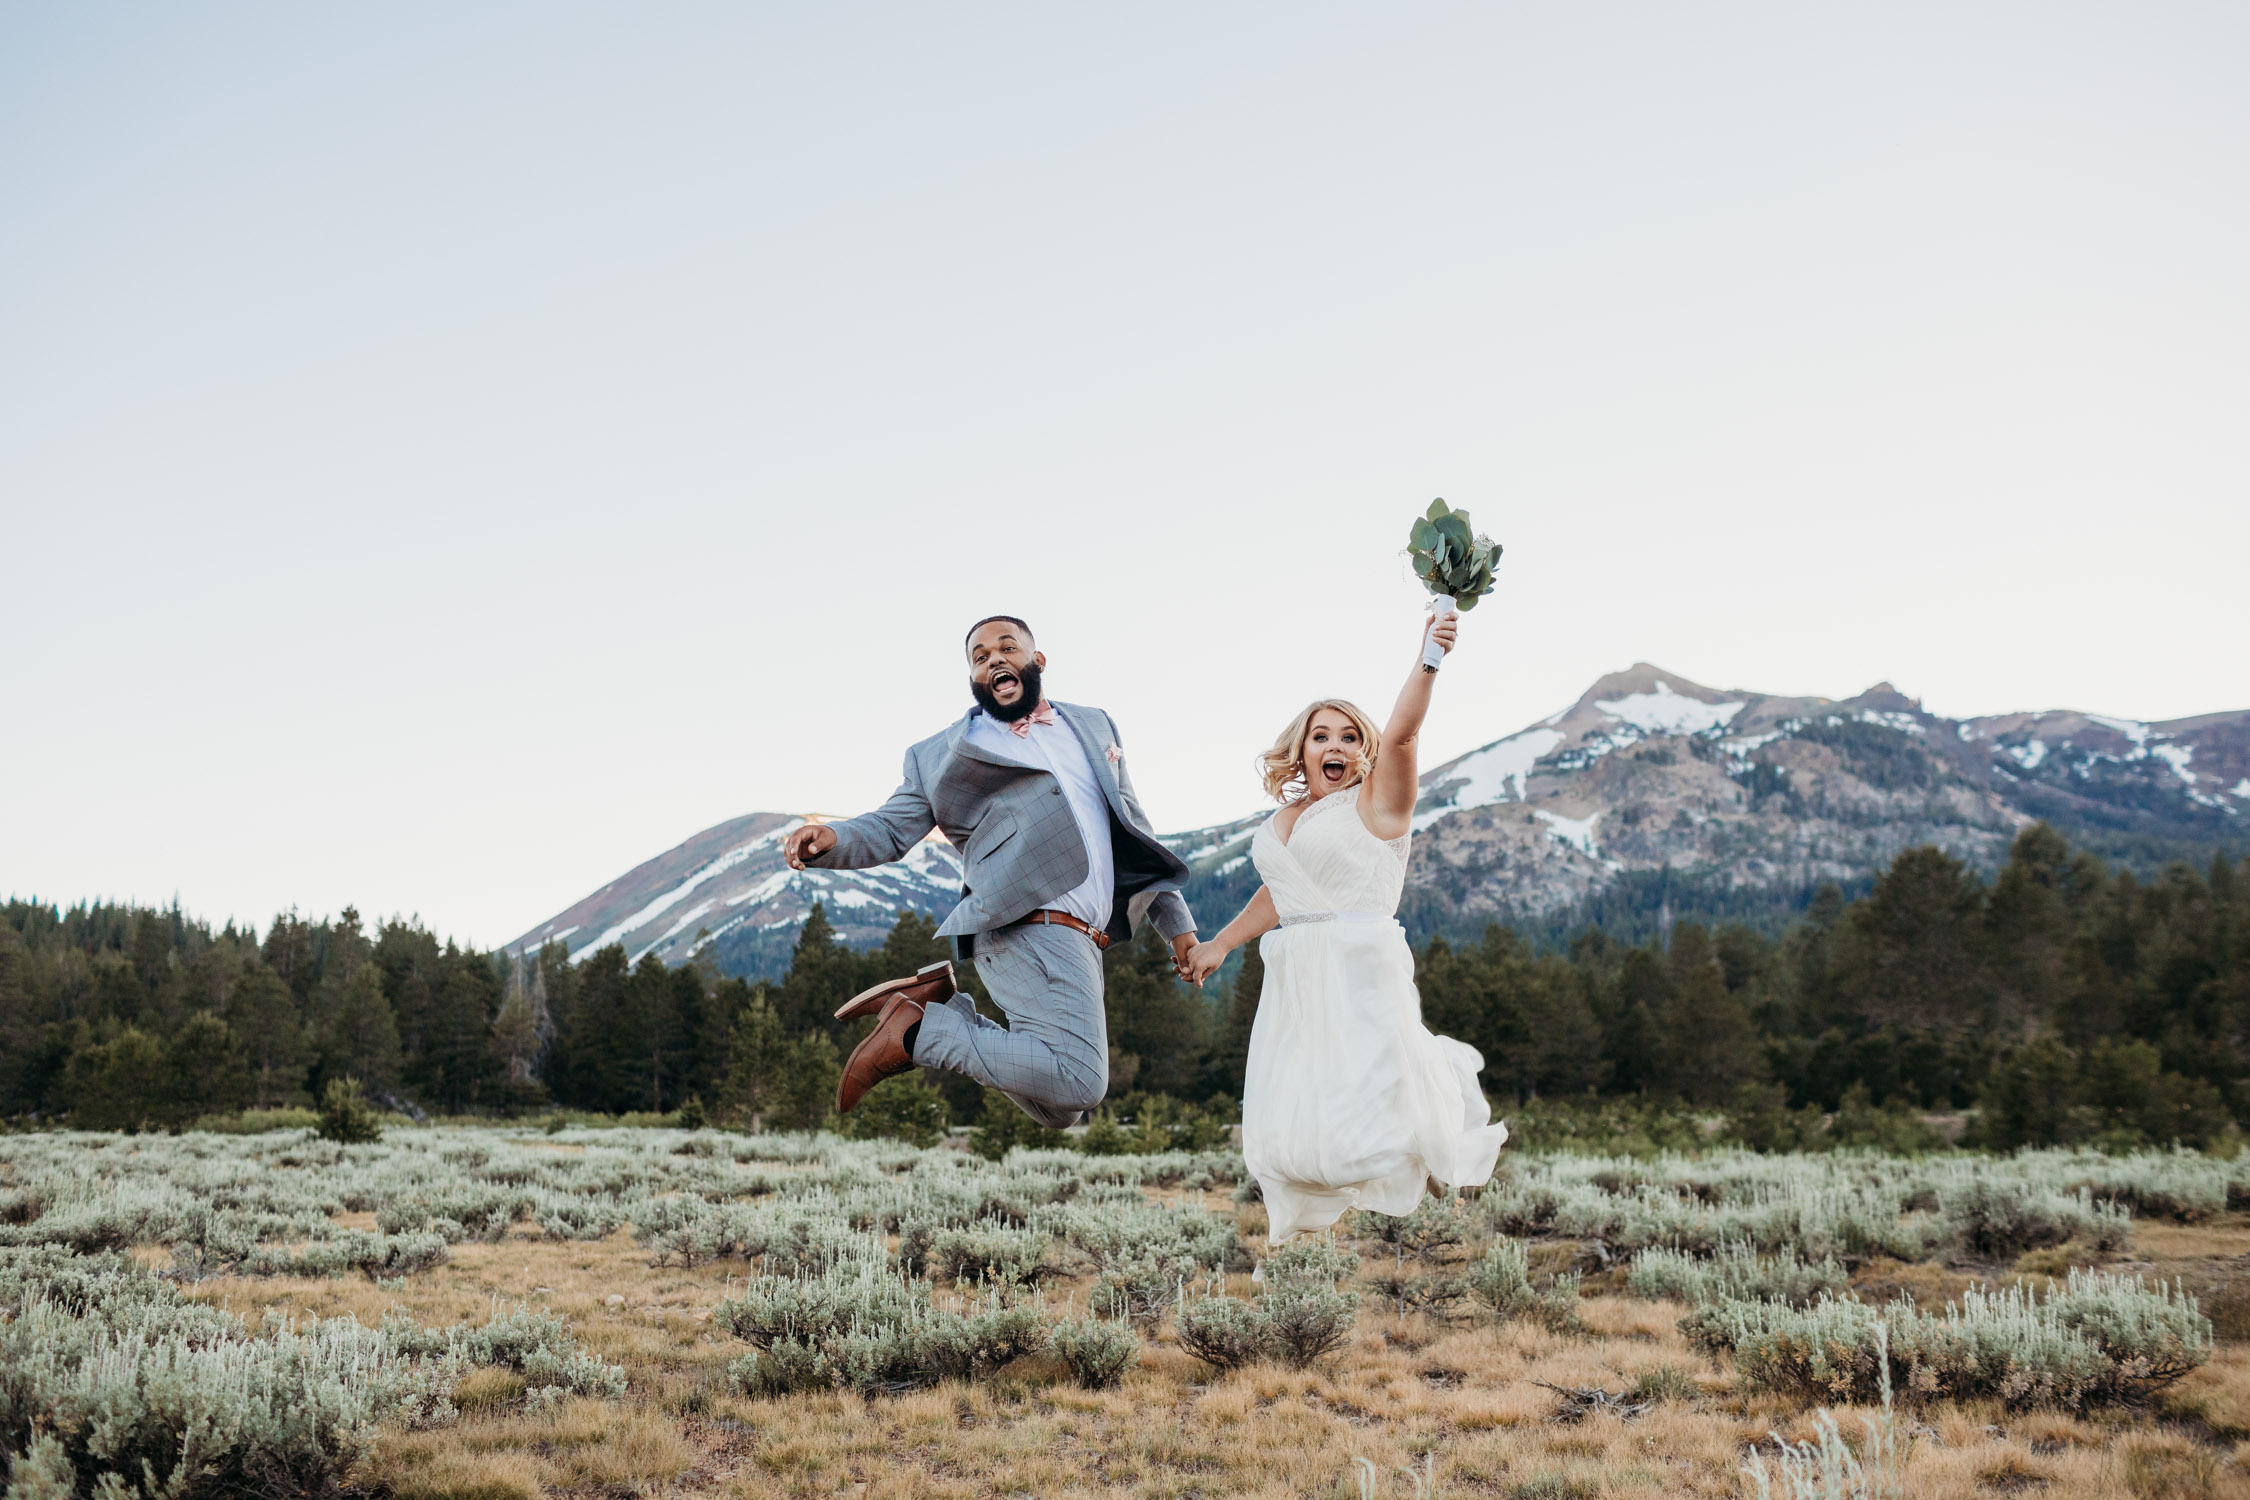 tahoe elopement at hope valley celebration